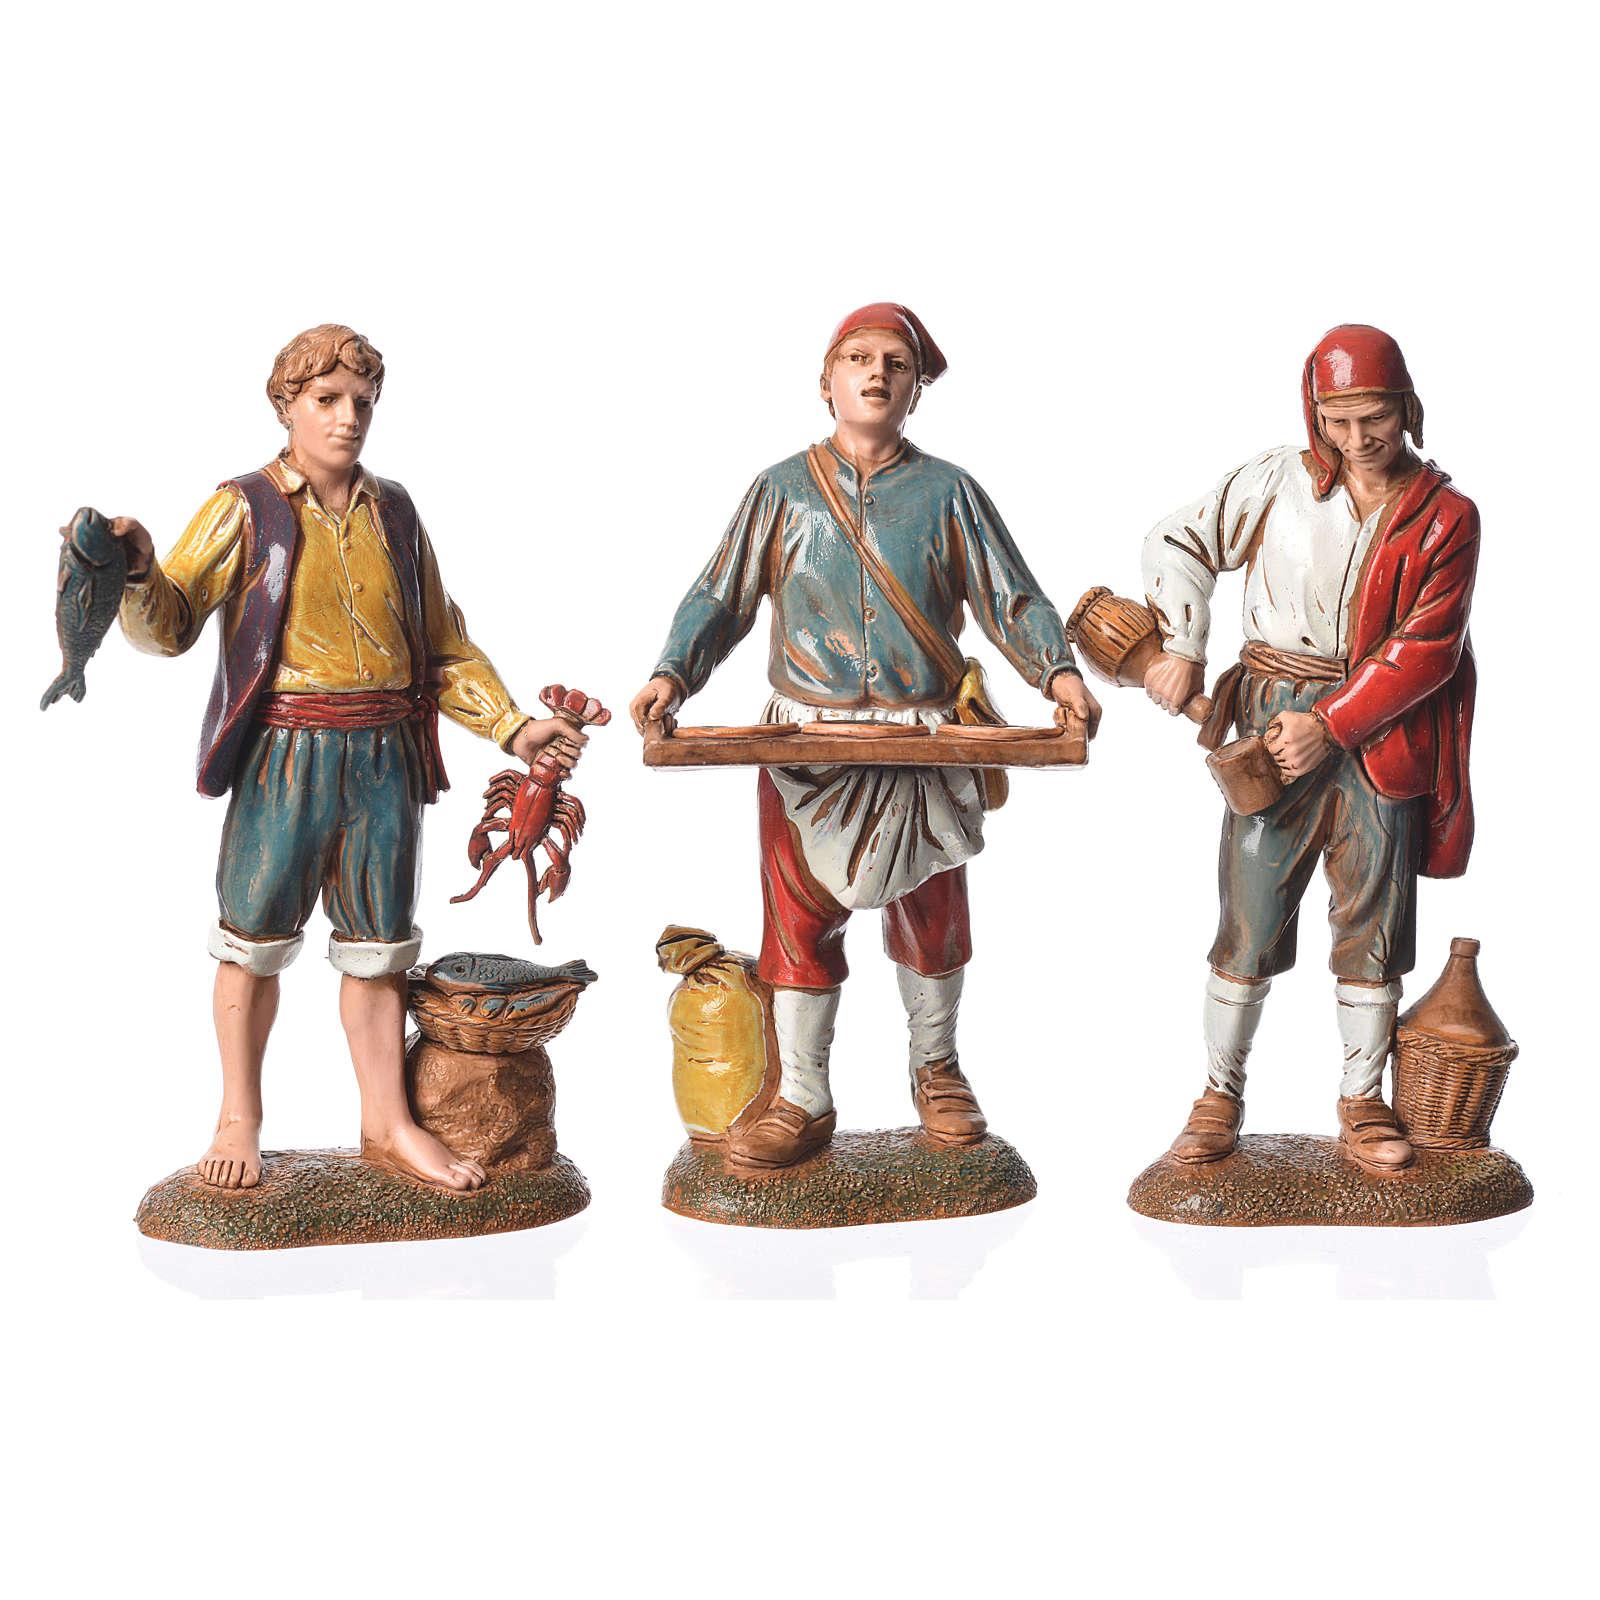 Neapolitan style characters, 3 nativity figurines, 6cm Moranduzzo 4